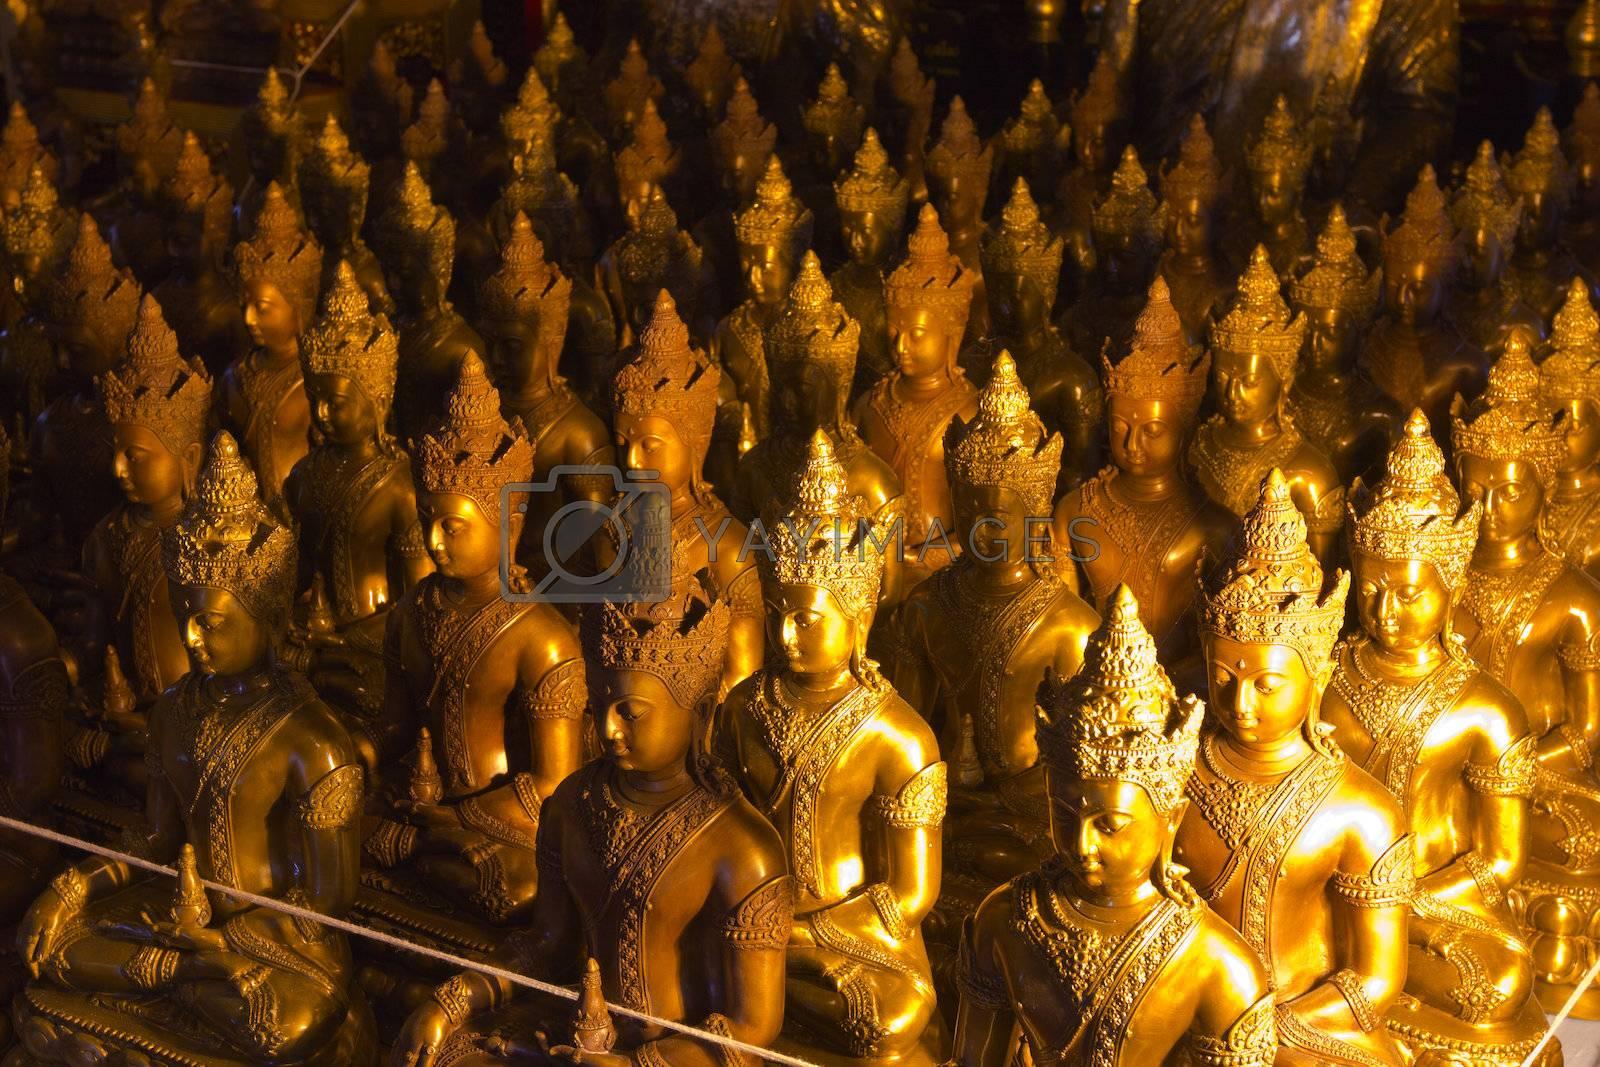 Seated buddha image in the attitude of subduing Mara with full regalia